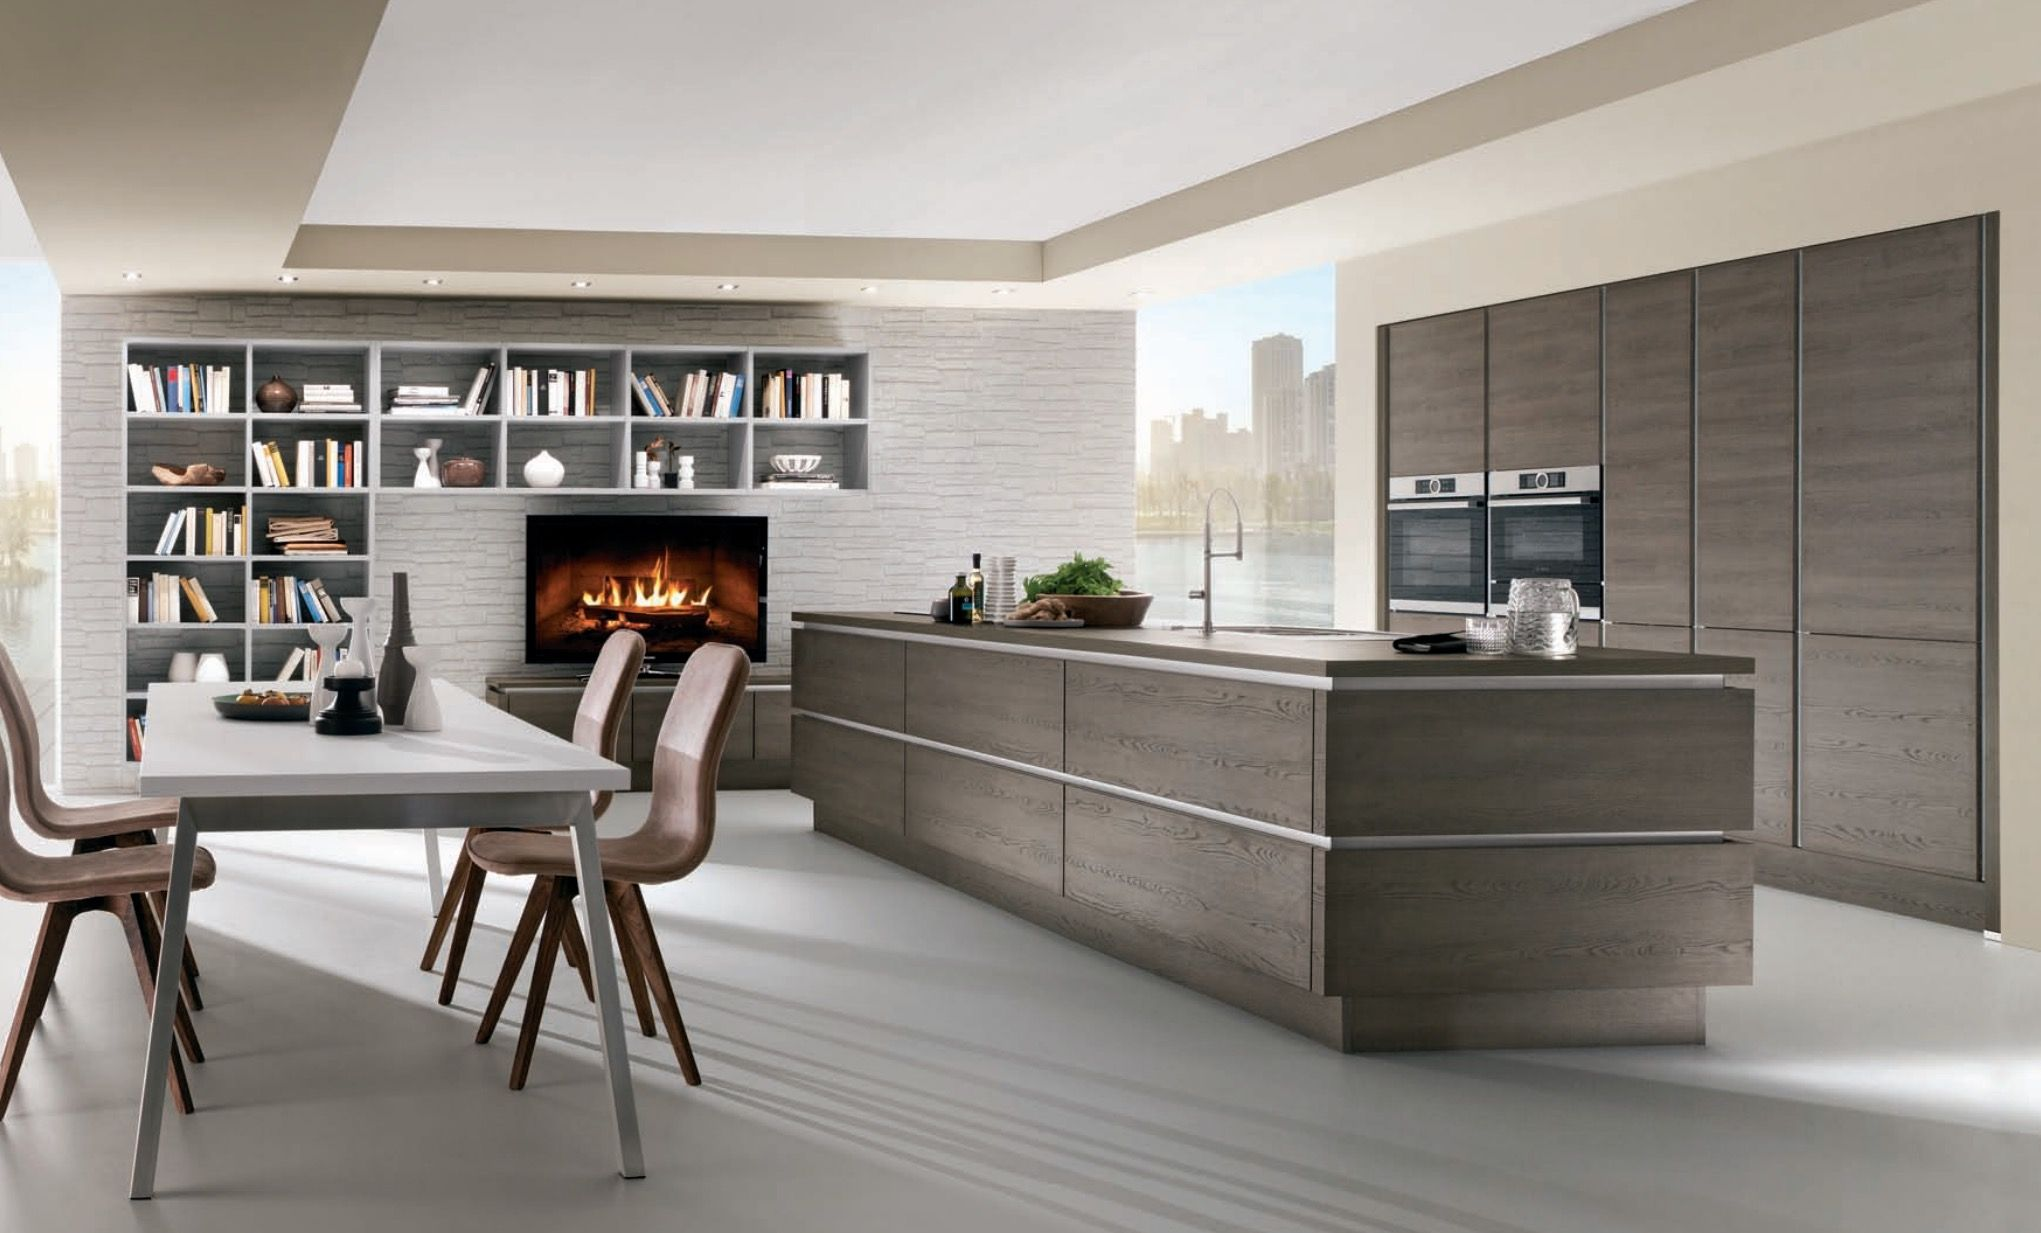 About alno modern kitchens on pinterest modern kitchen cabinets - Kitchens